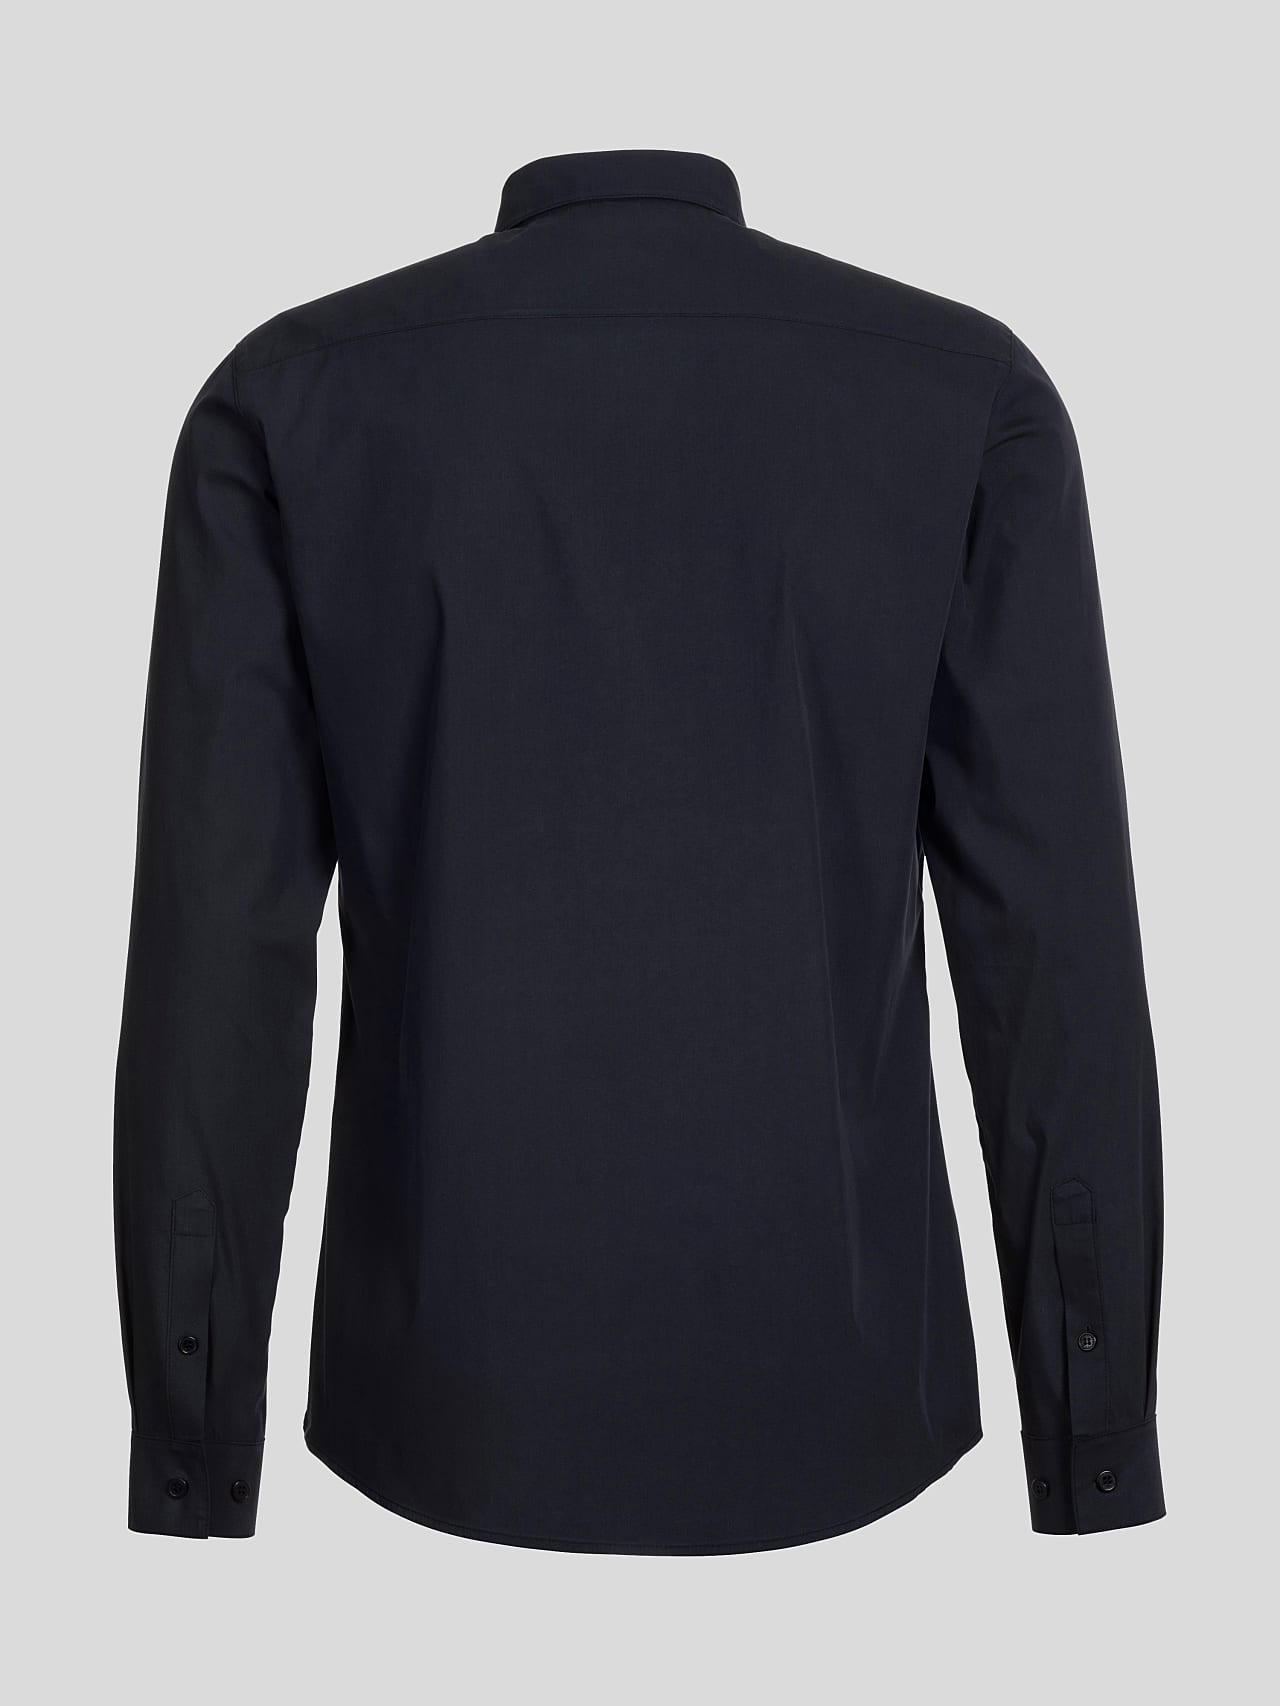 WAARG V1.Y5.01 Cotton-Stretch Shirt navy Left Alpha Tauri